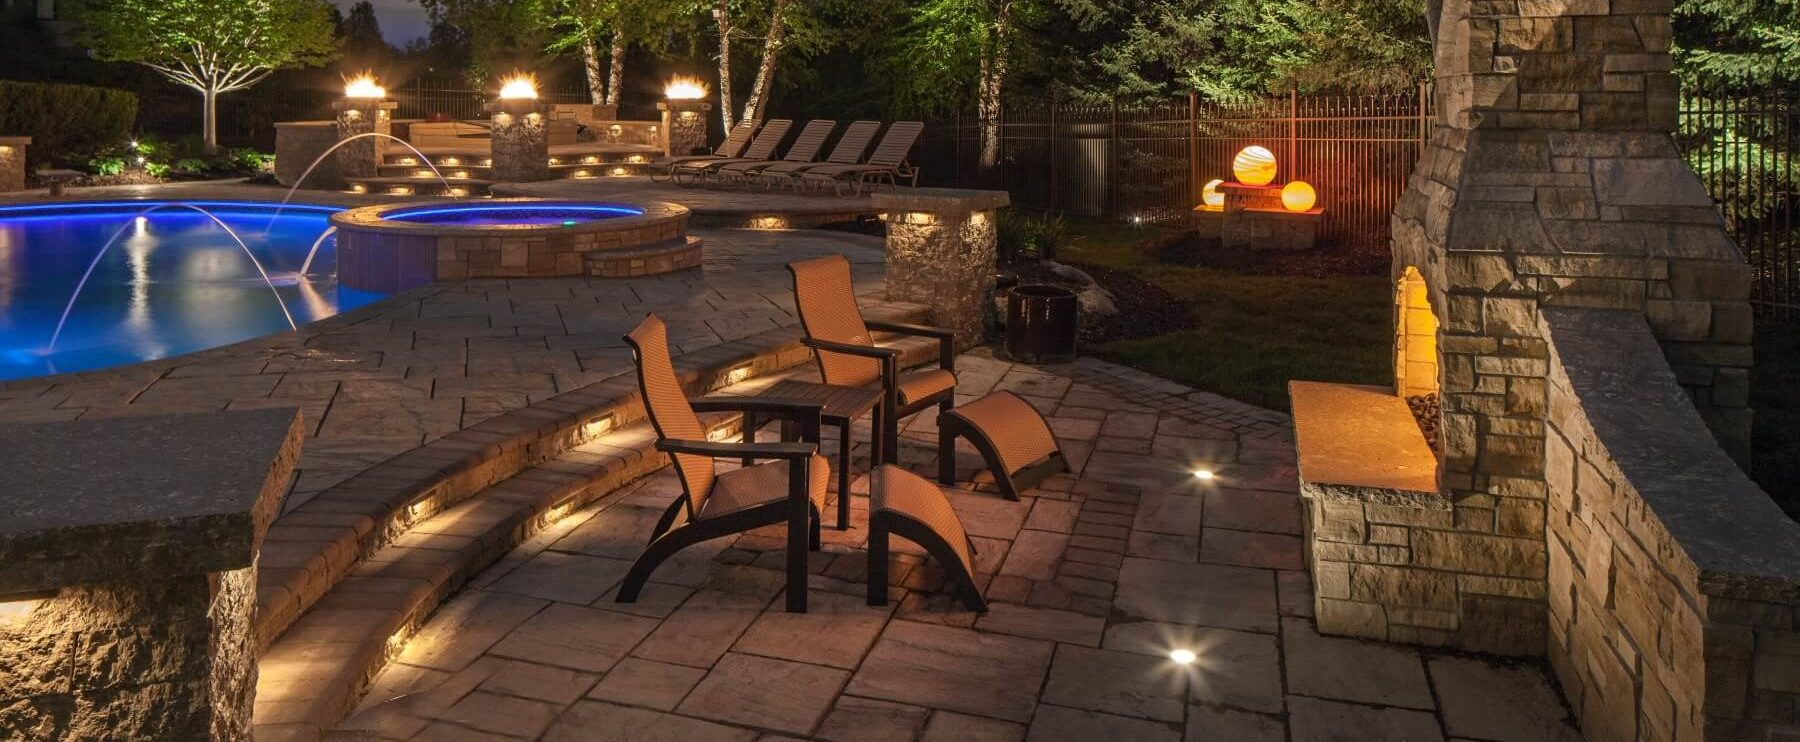 Outdoor lighting ideas inspiration mckay landscape lighting outdoor landscape lighting ideas inspiration aloadofball Choice Image